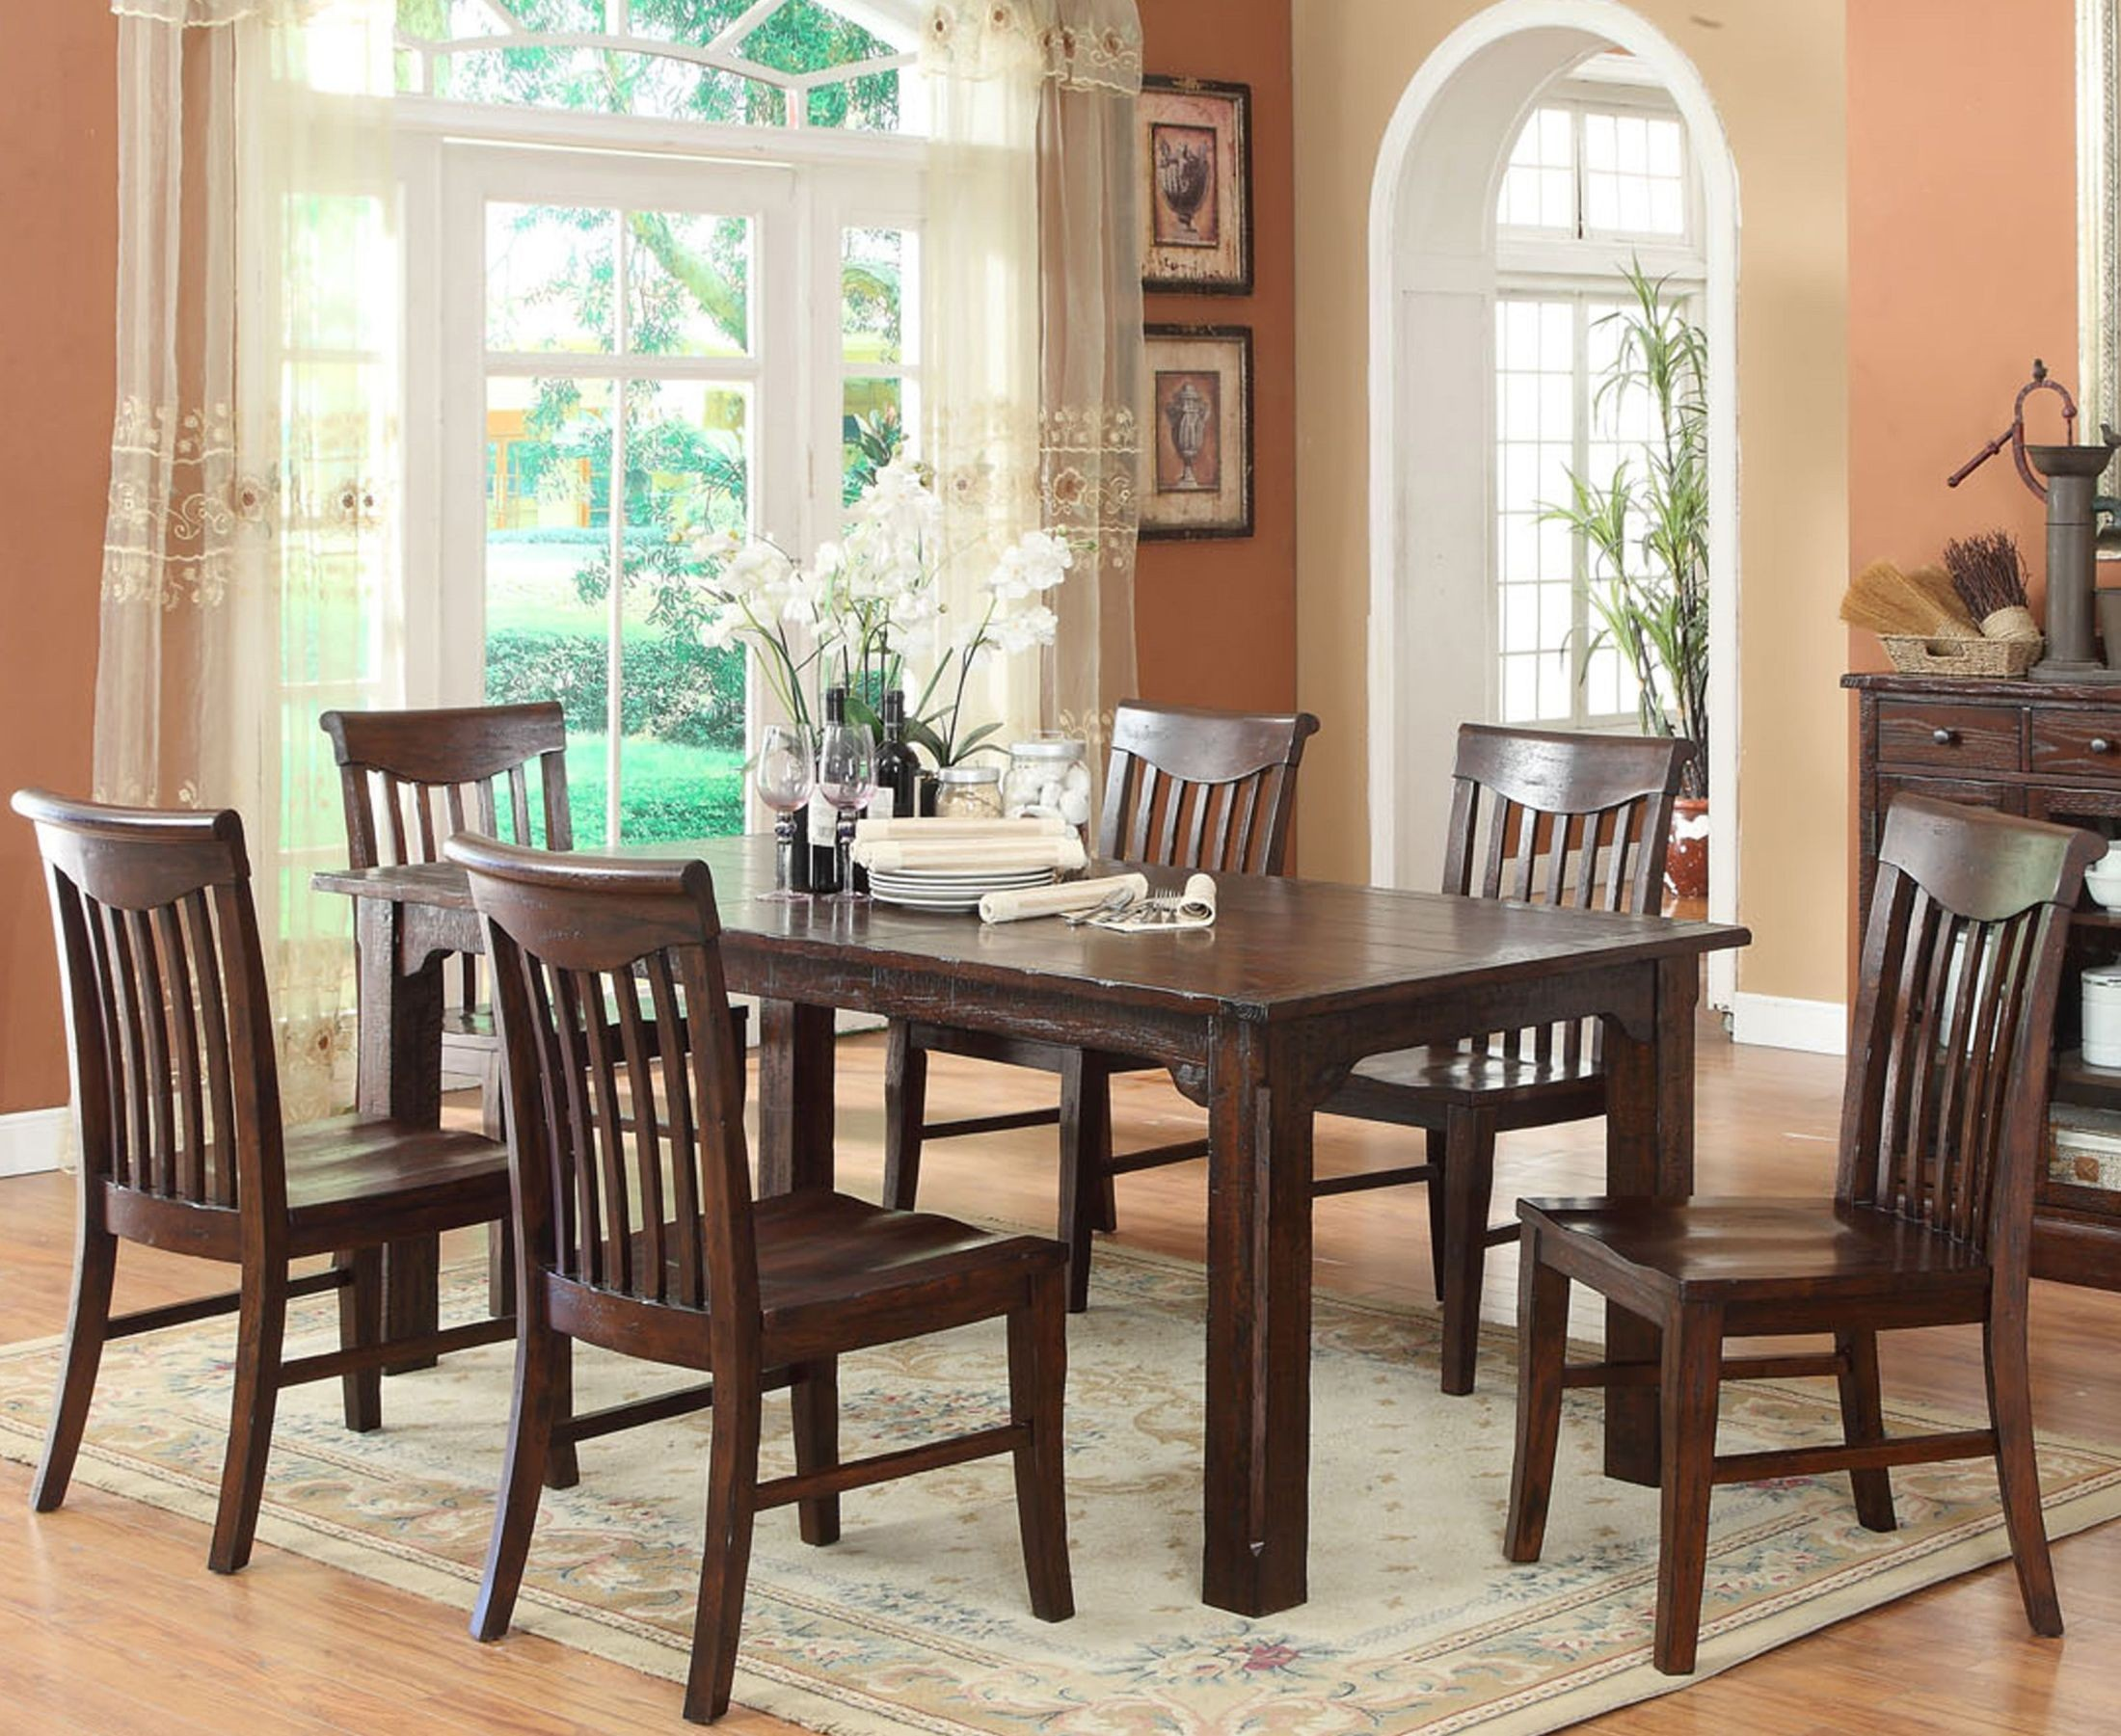 Distressed White Oak Dining Chairs: Gettysburg Distressed Dark Oak Leg Dining Room Set From